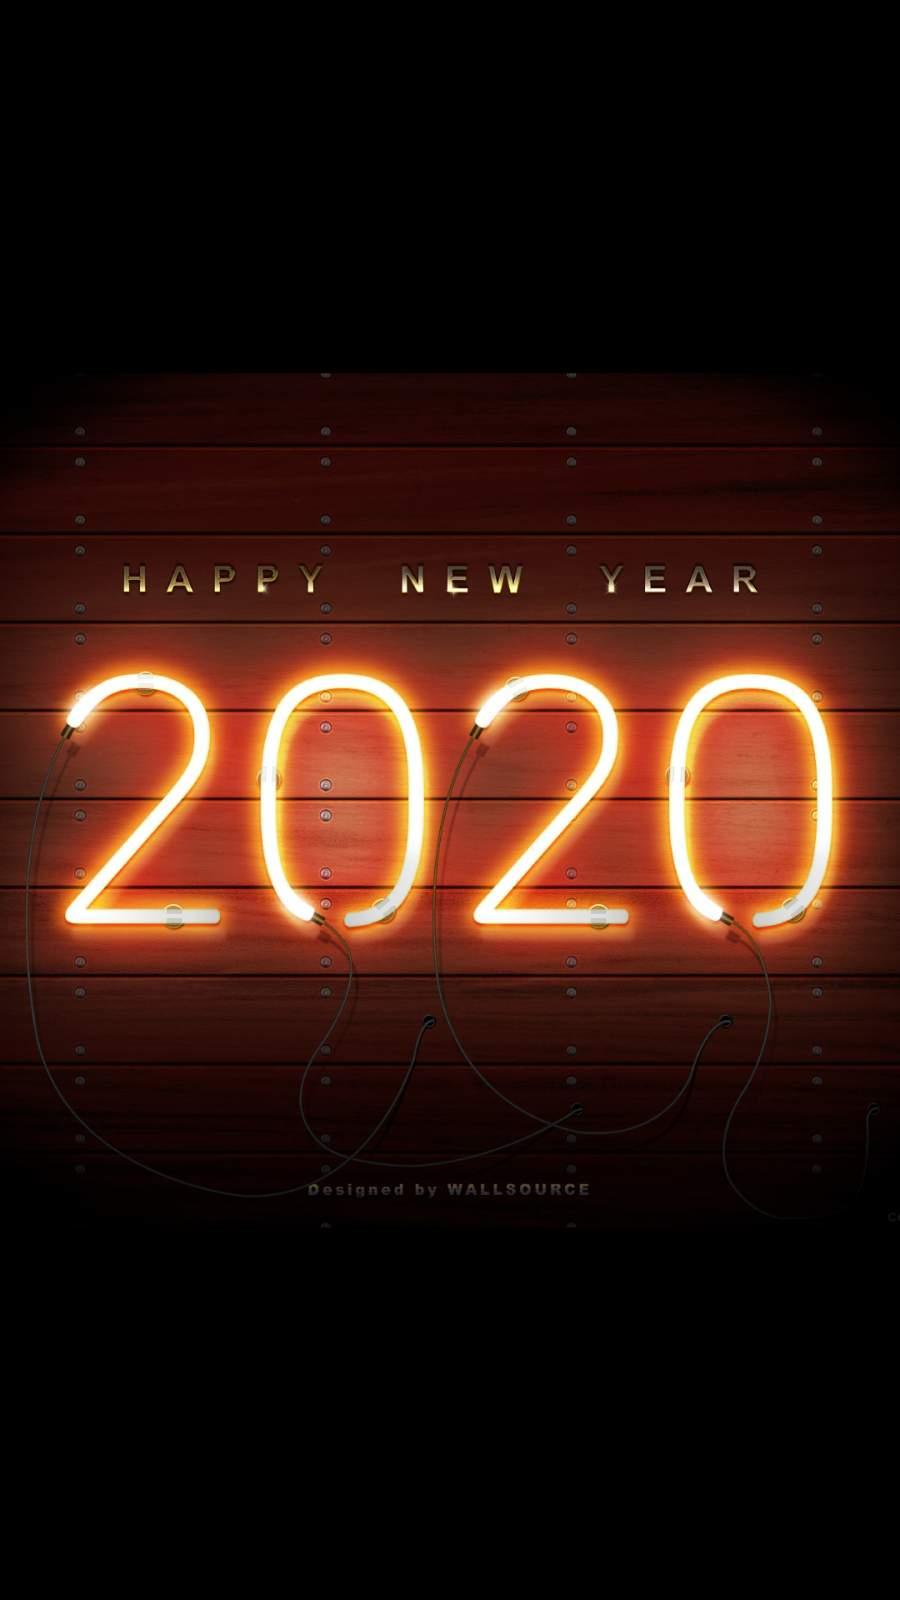 2020 iPhone Wallpaper 1